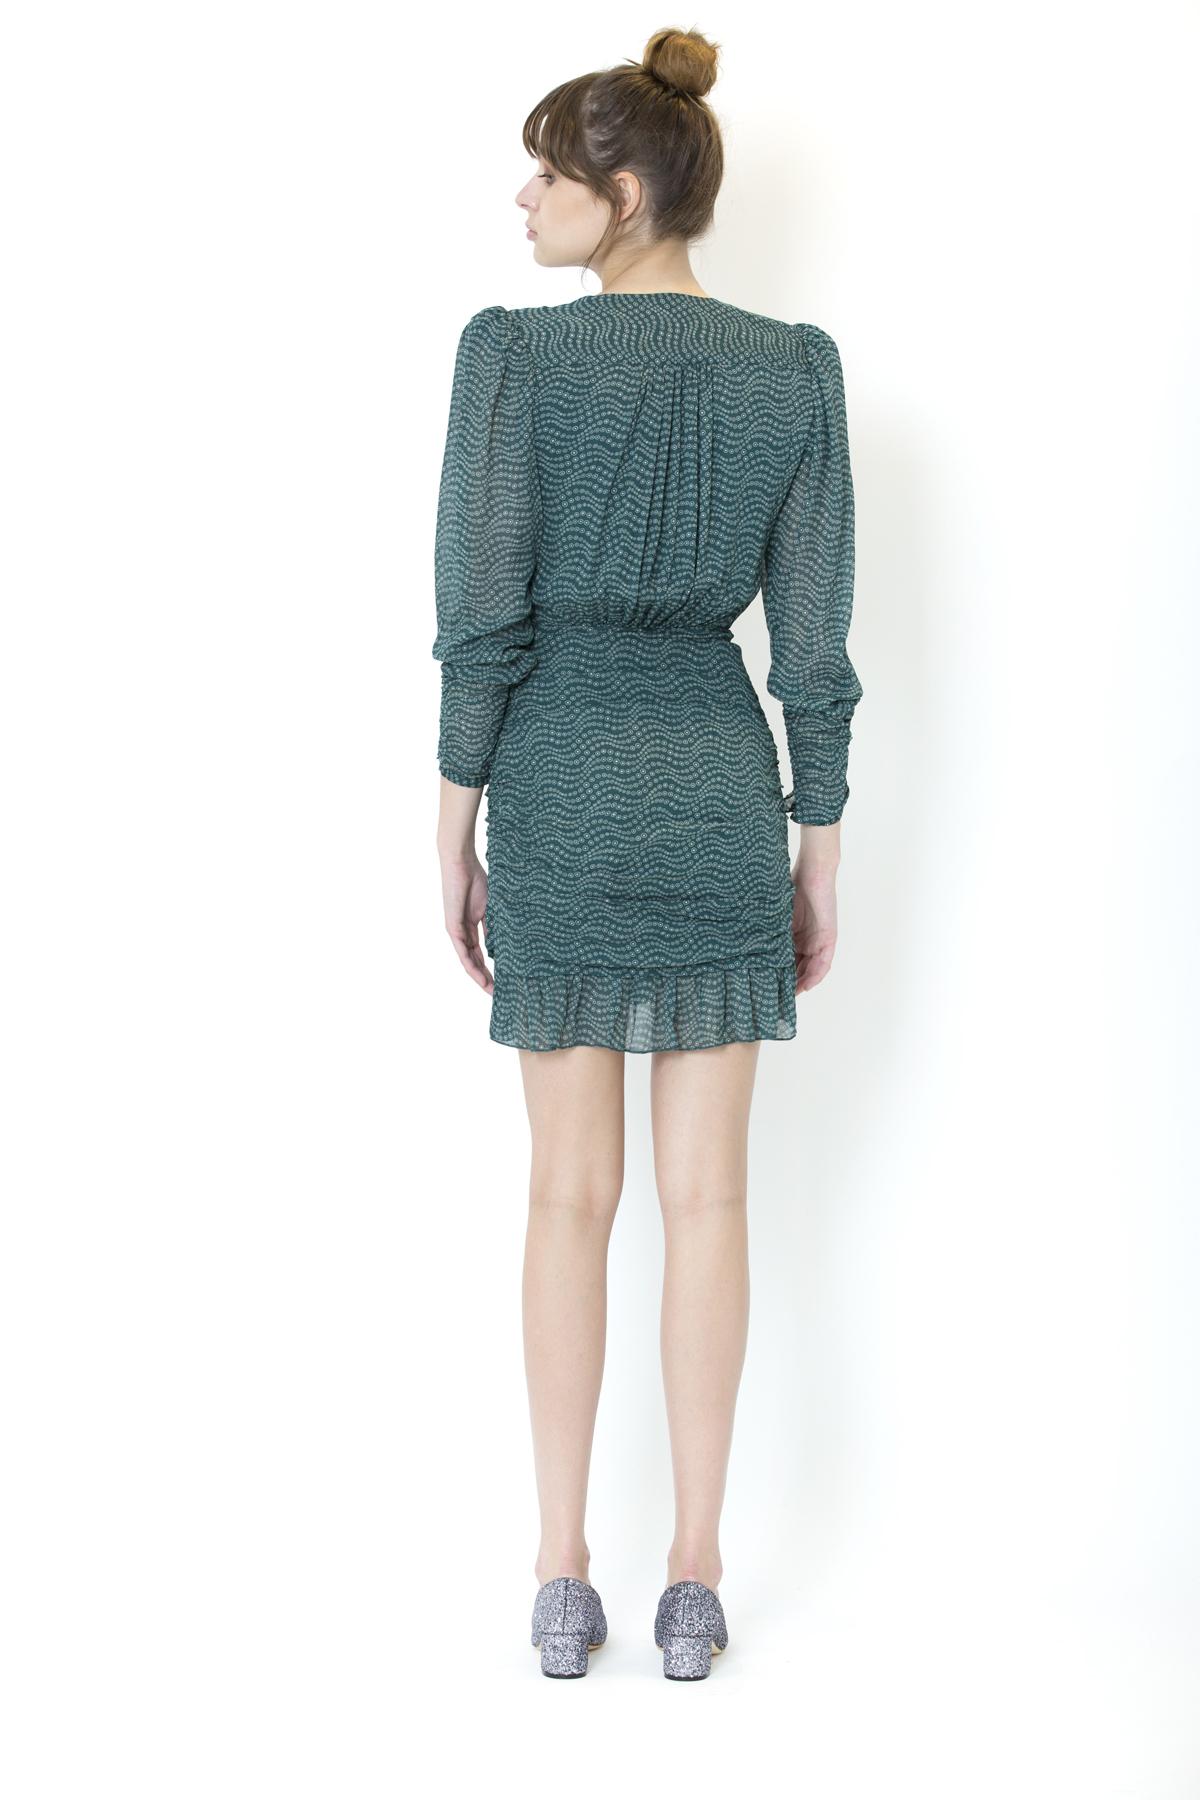 bash-little-green-dress-print-trasparency-frill-matchboxathens